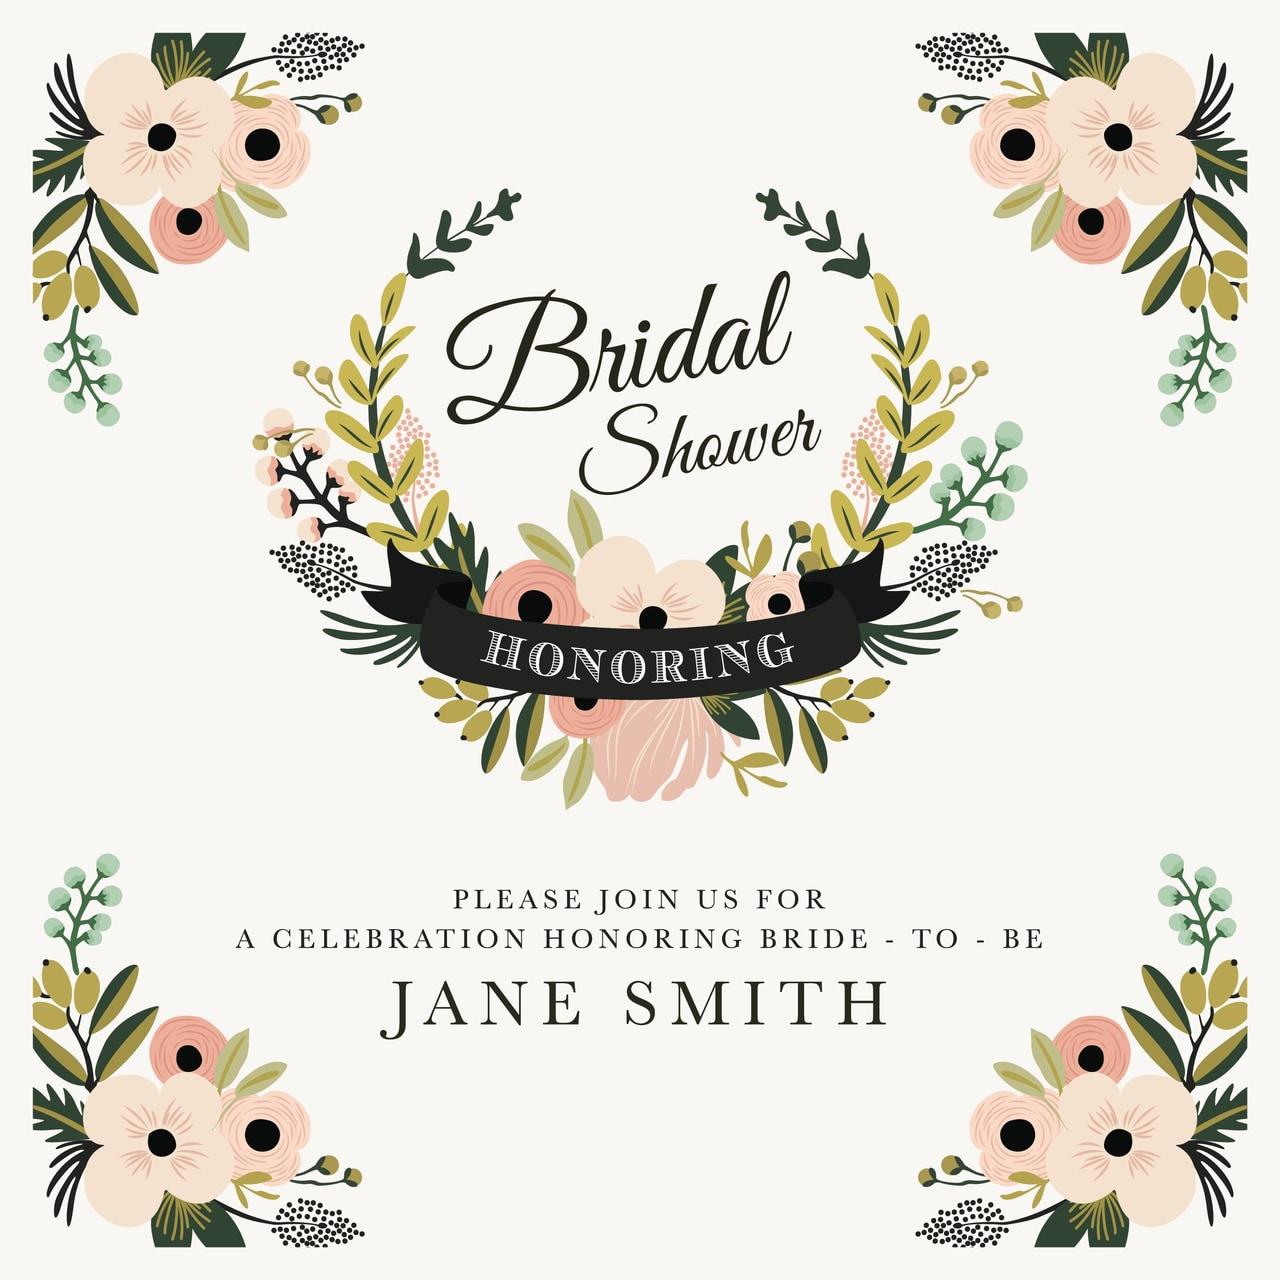 article, invitation, and bridal shower invitation image